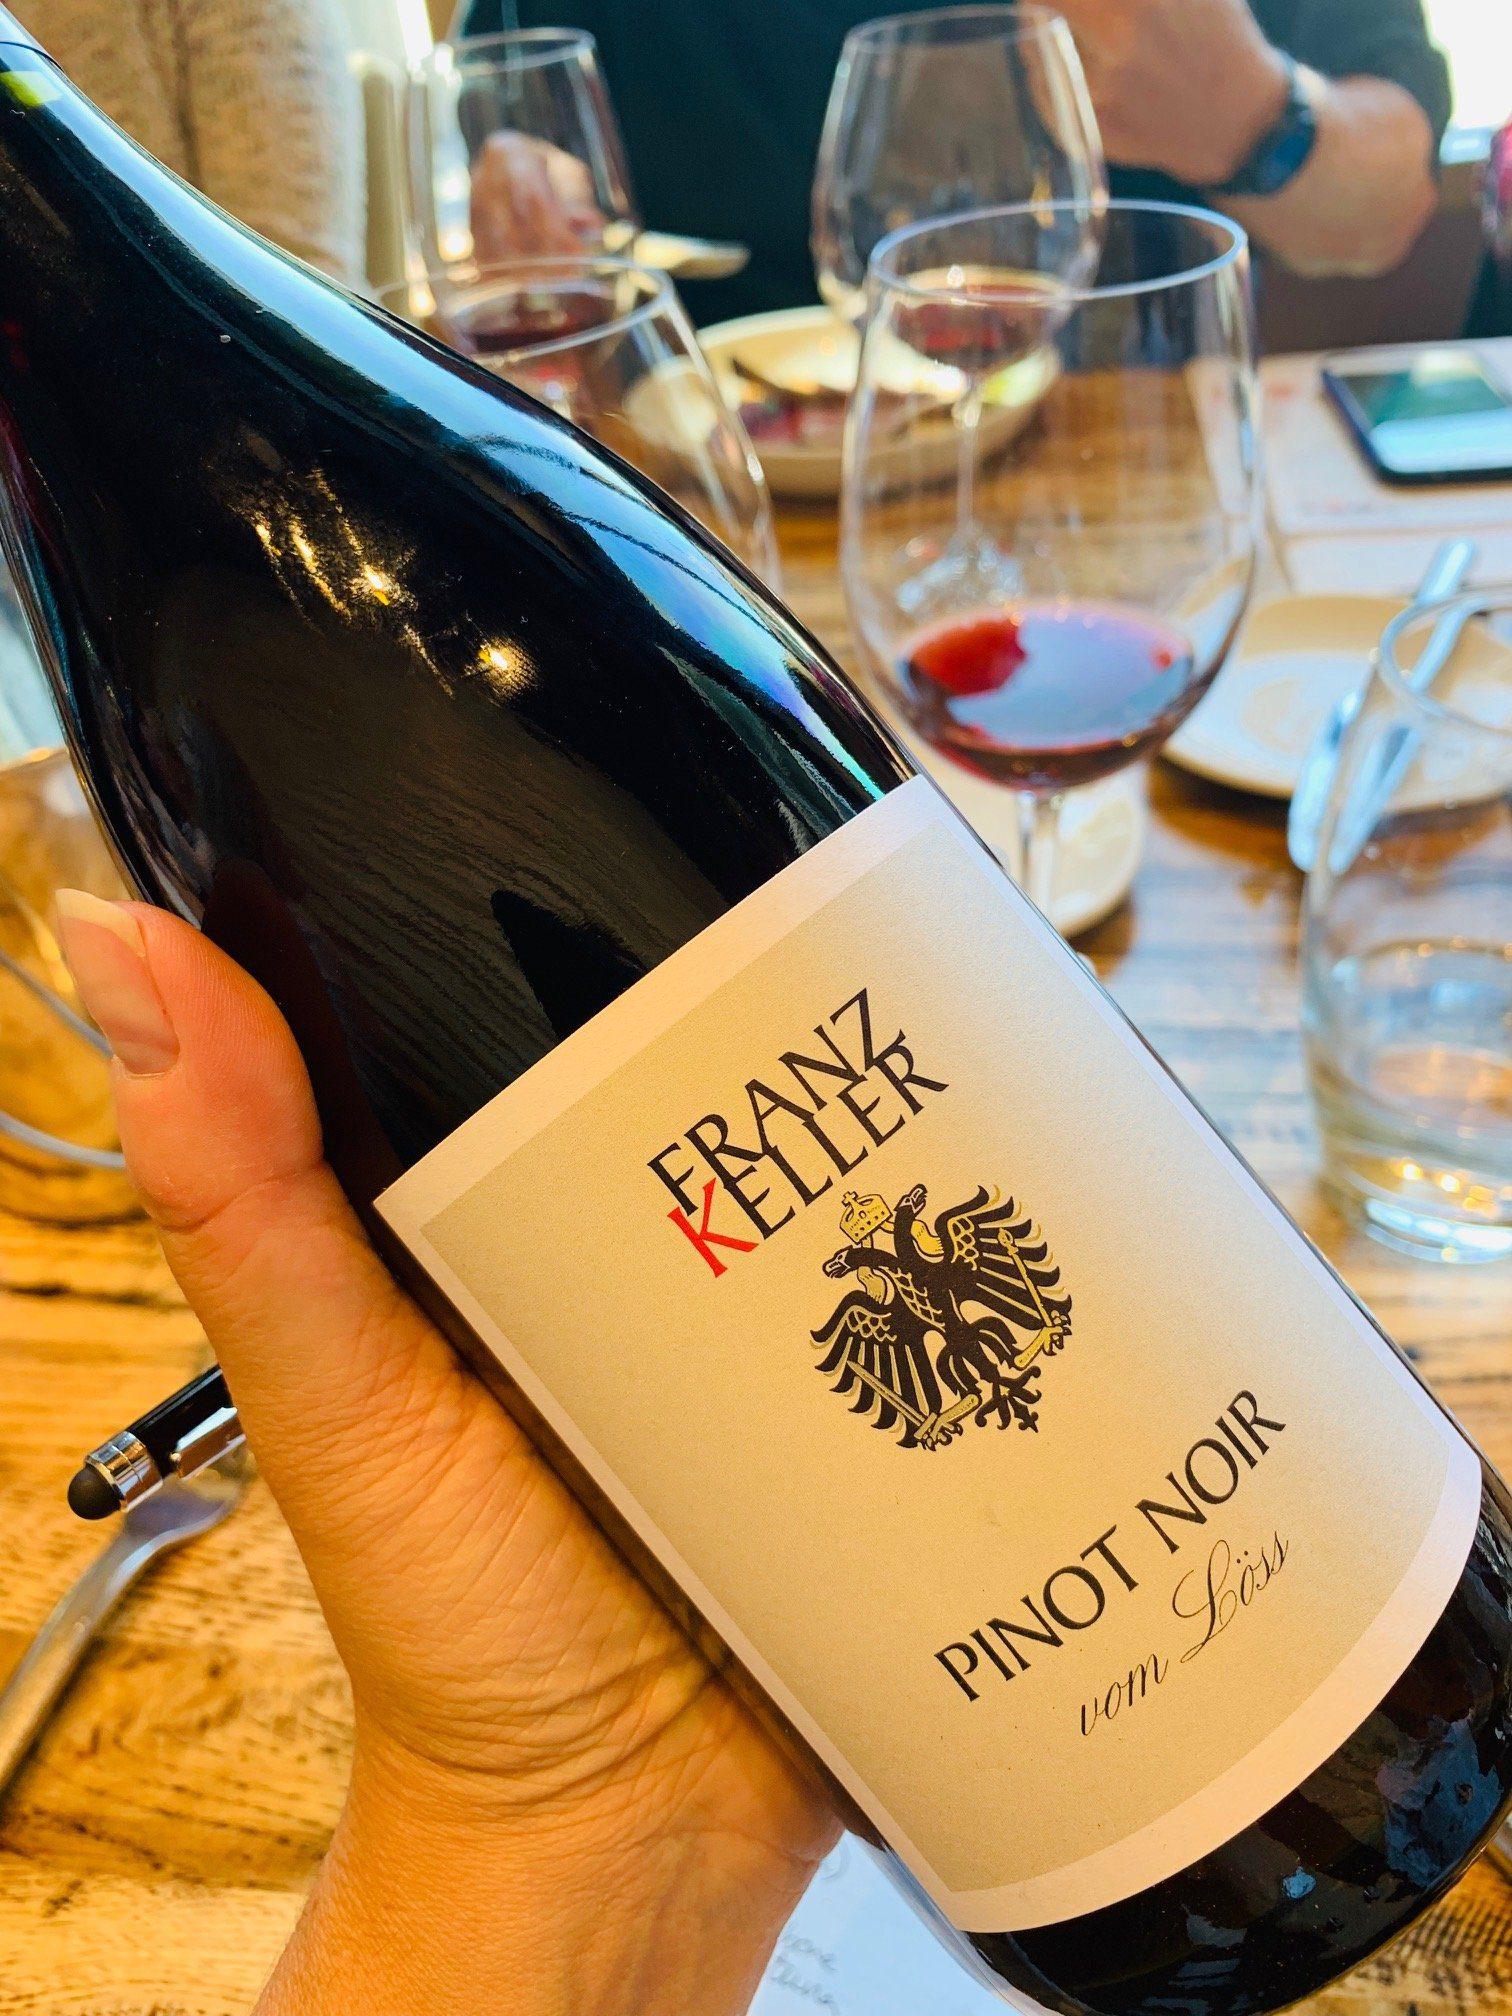 2016 Frank Keller Pinot Noir, Baden